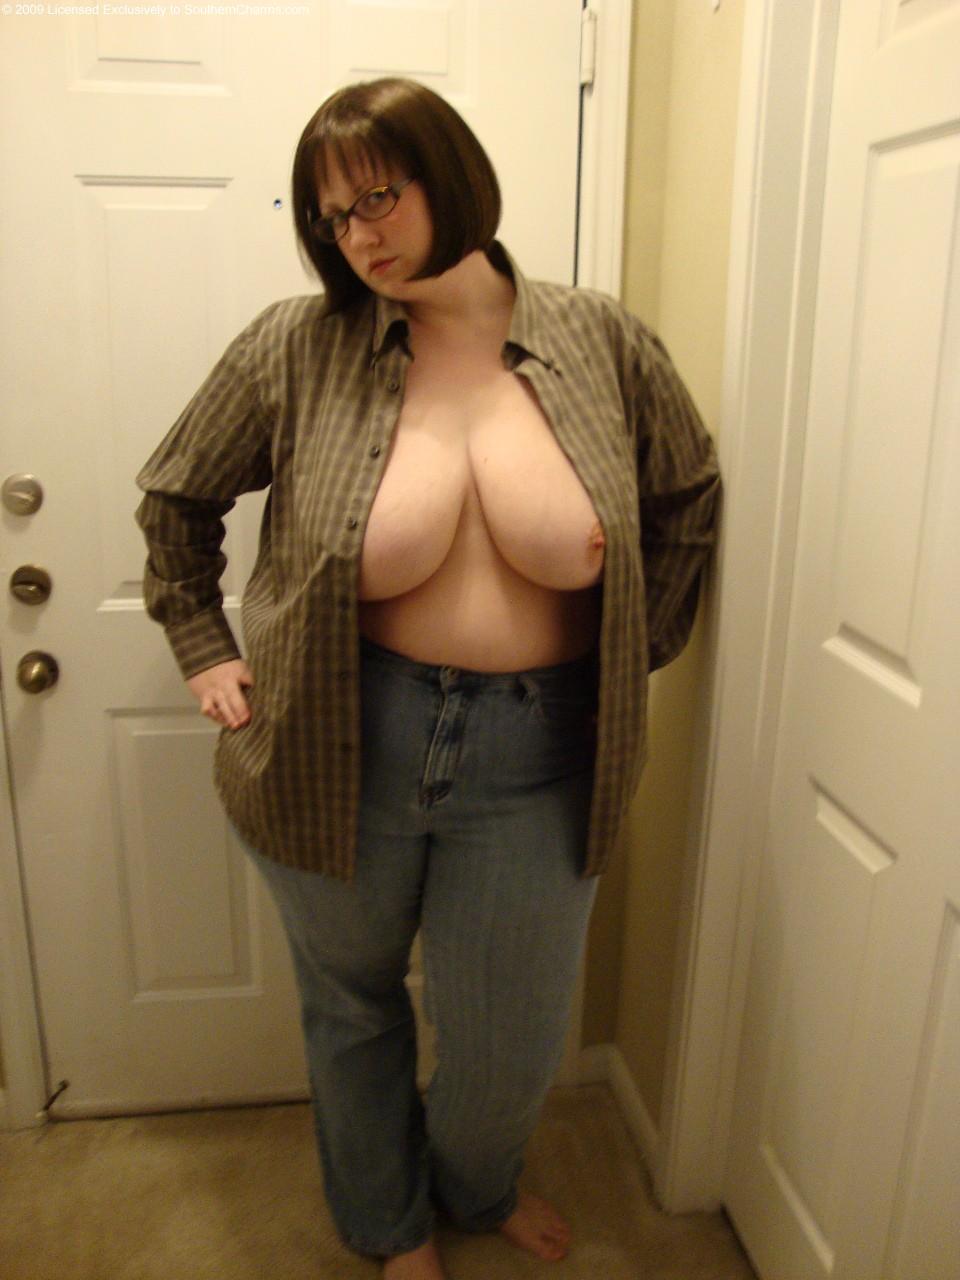 Beautiful women with big breasts